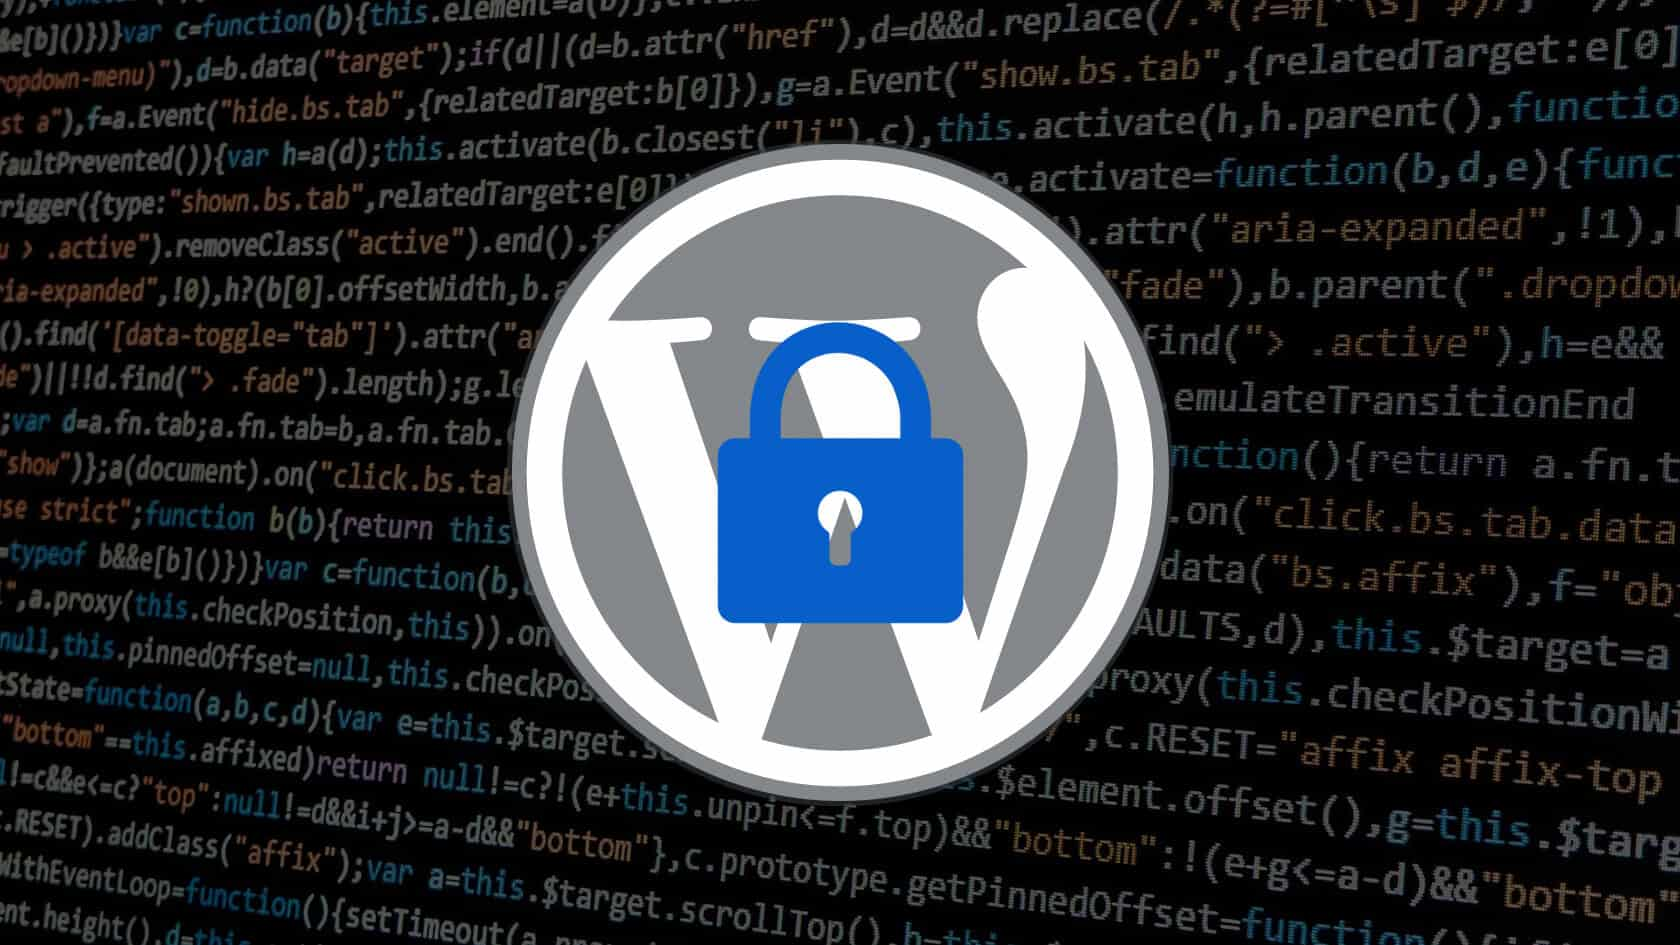 fight fraudulent transactions on WordPress